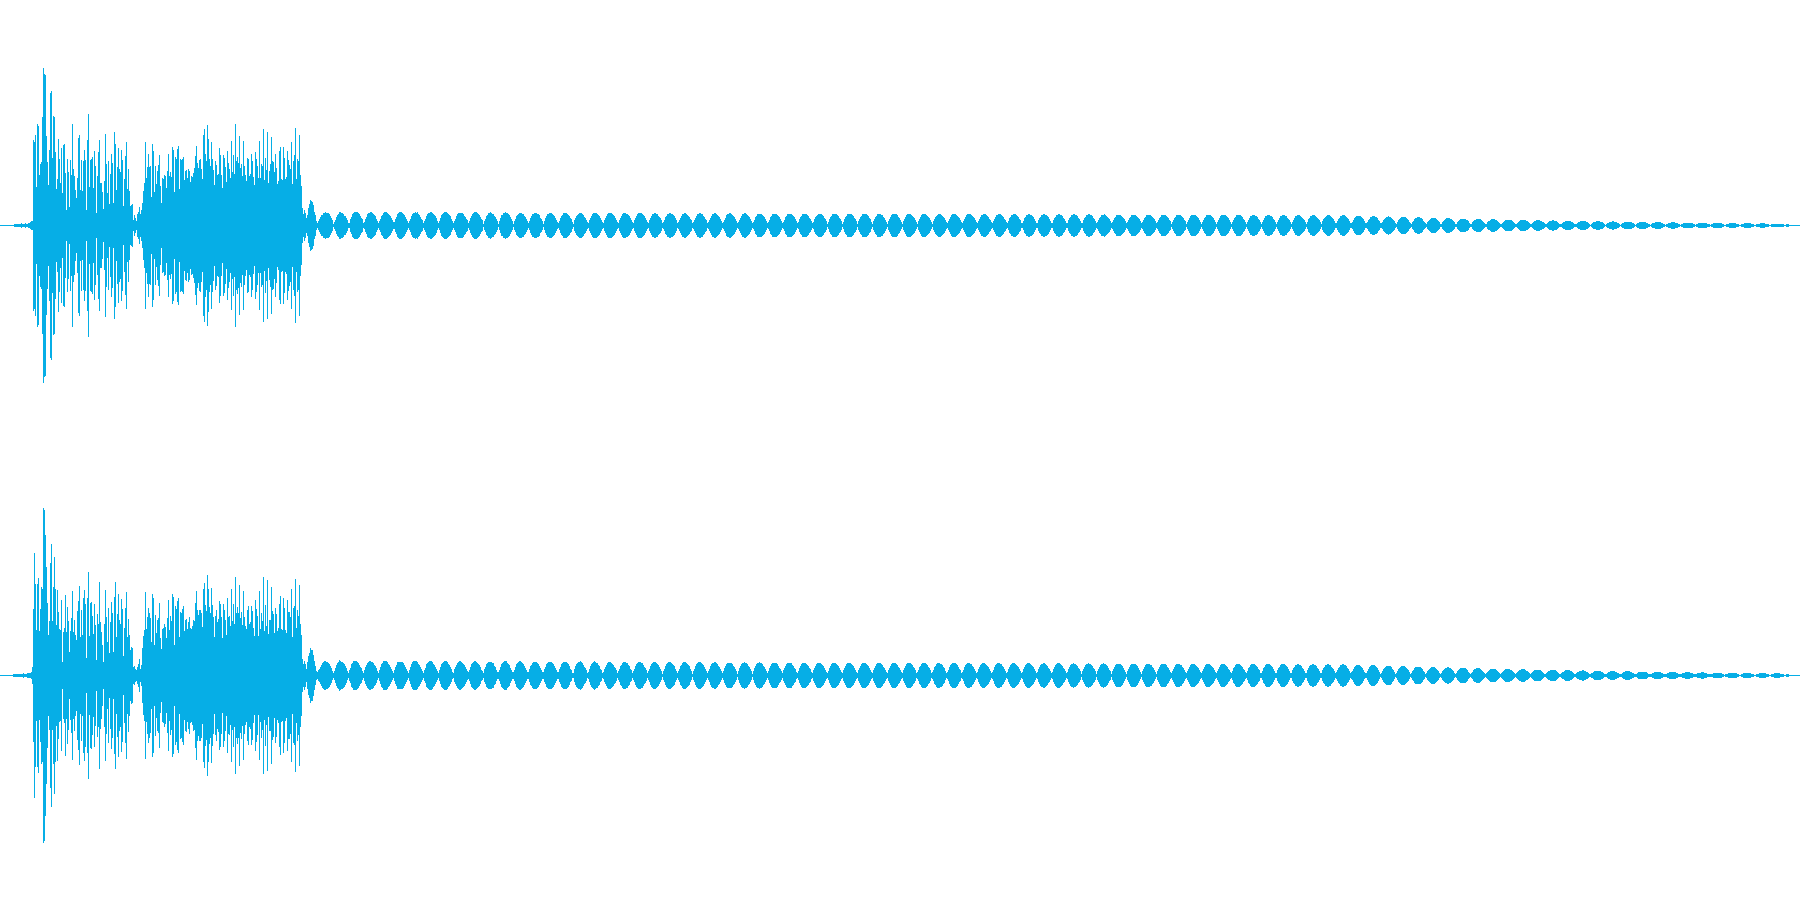 8bit効果音「ディロリンッ」の再生済みの波形